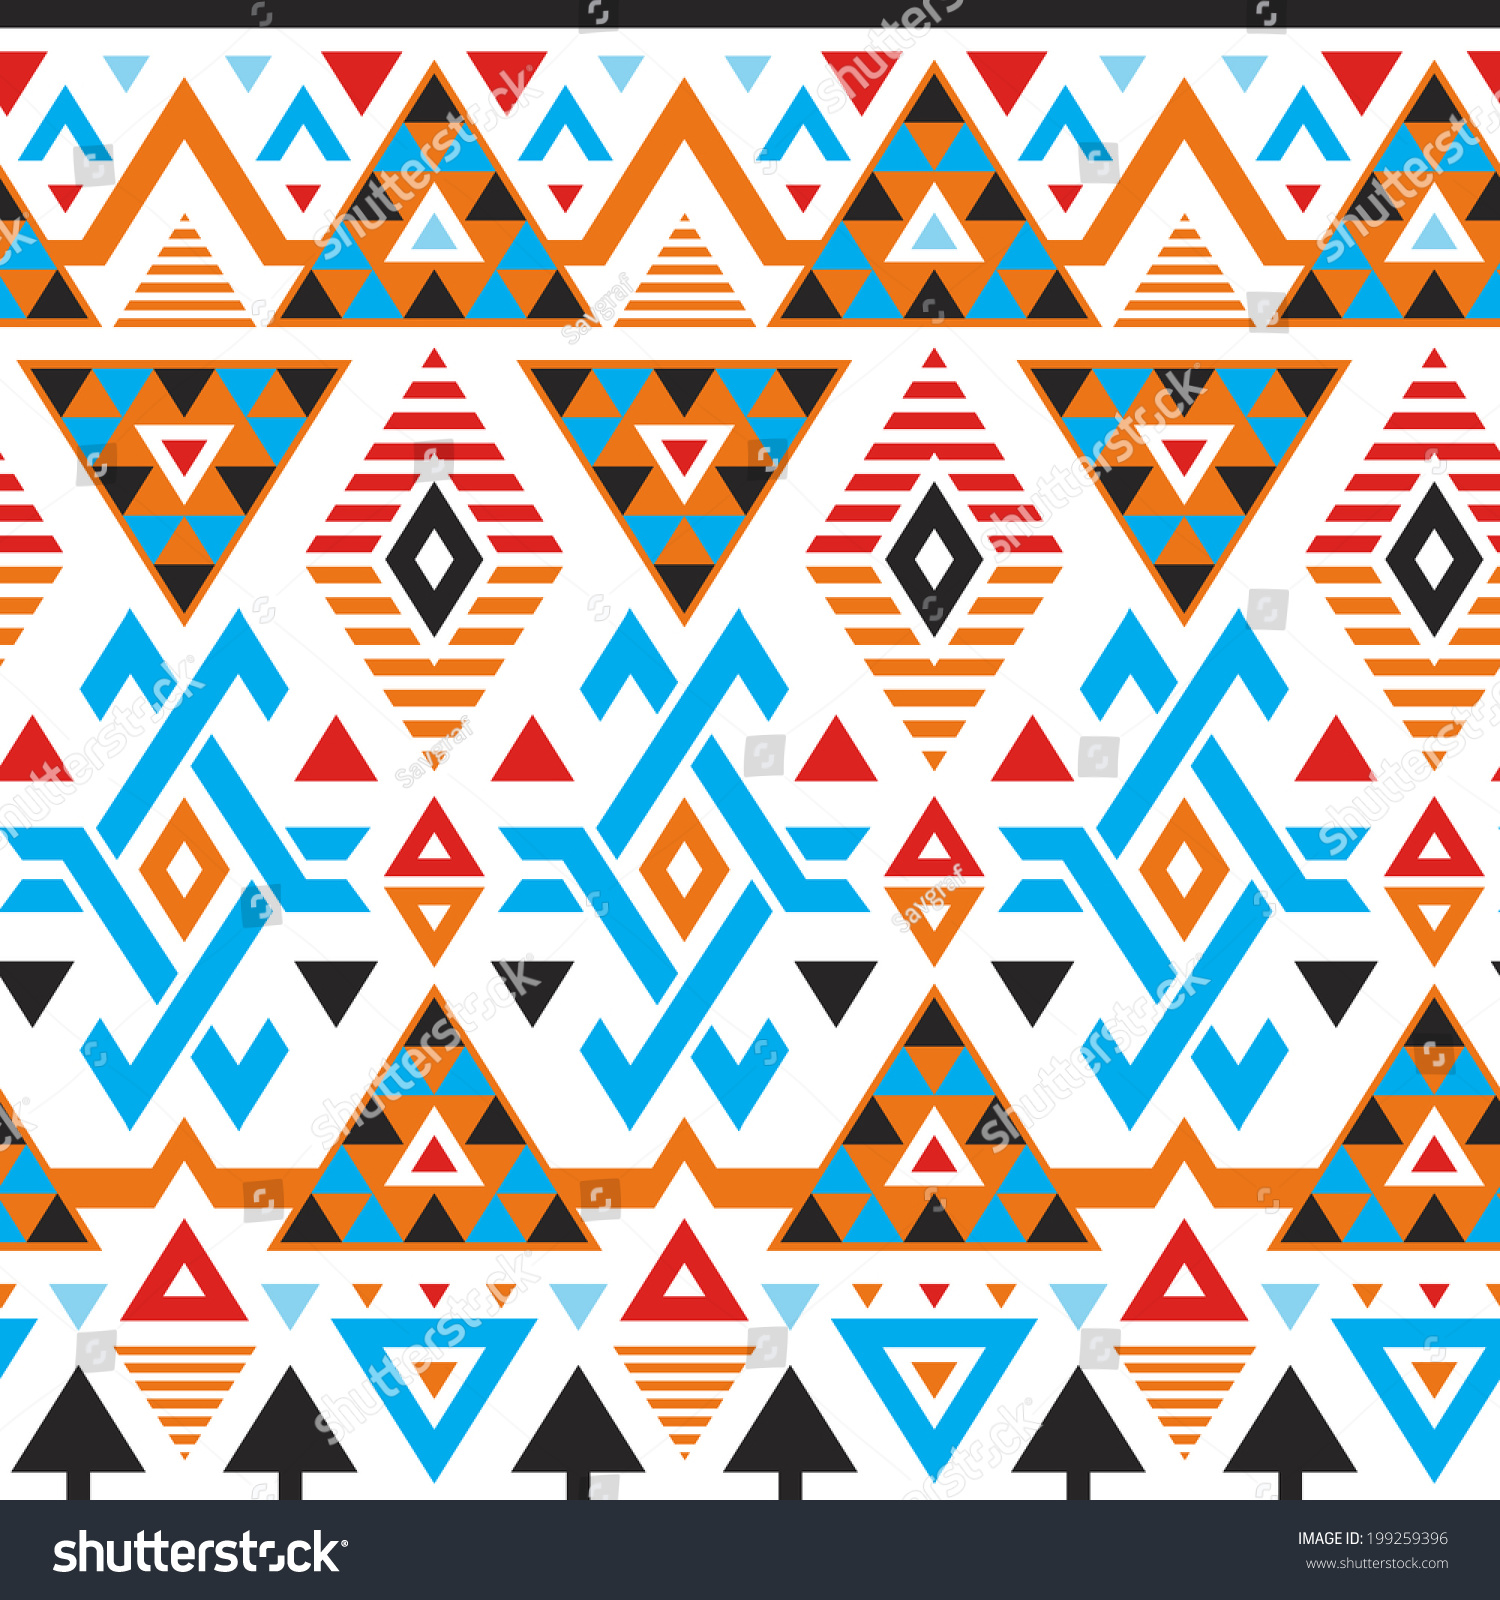 Hawaiian Triangle Tribal Patterns